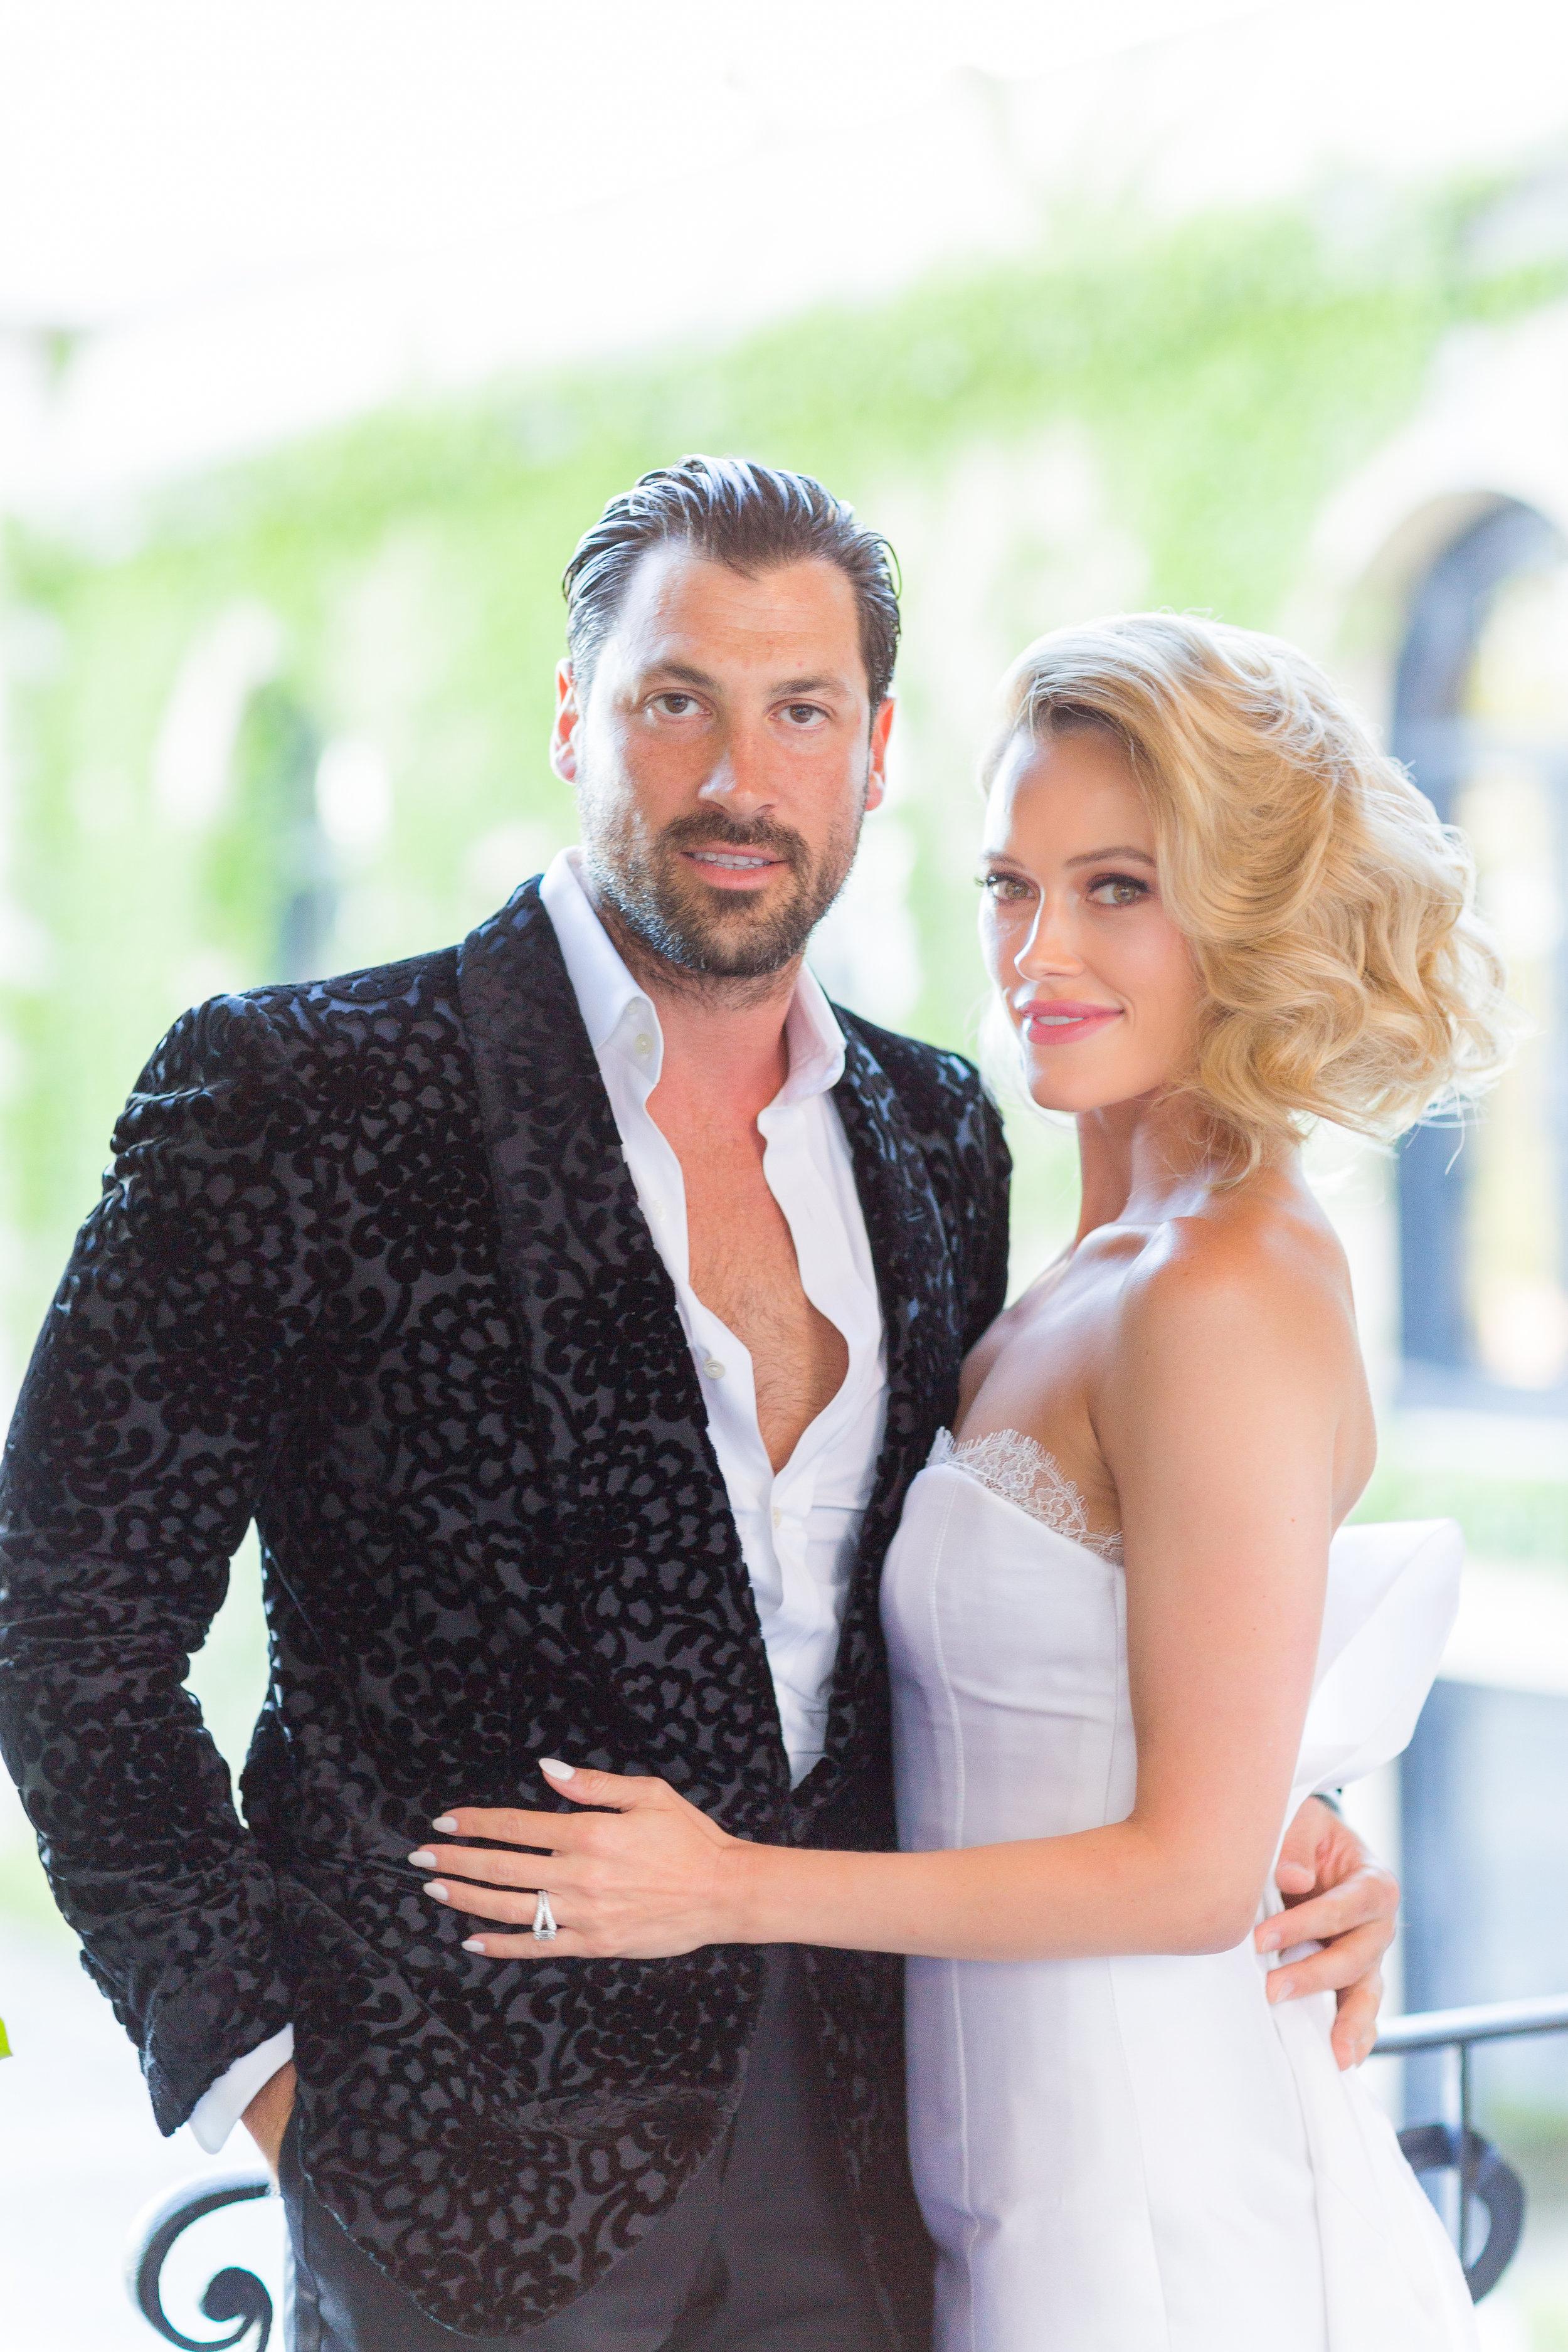 Peta Murgatroyd and Maksim Chmerkovskiy Wedding Jamie Levine Photography Oheka Castle 002.jpg